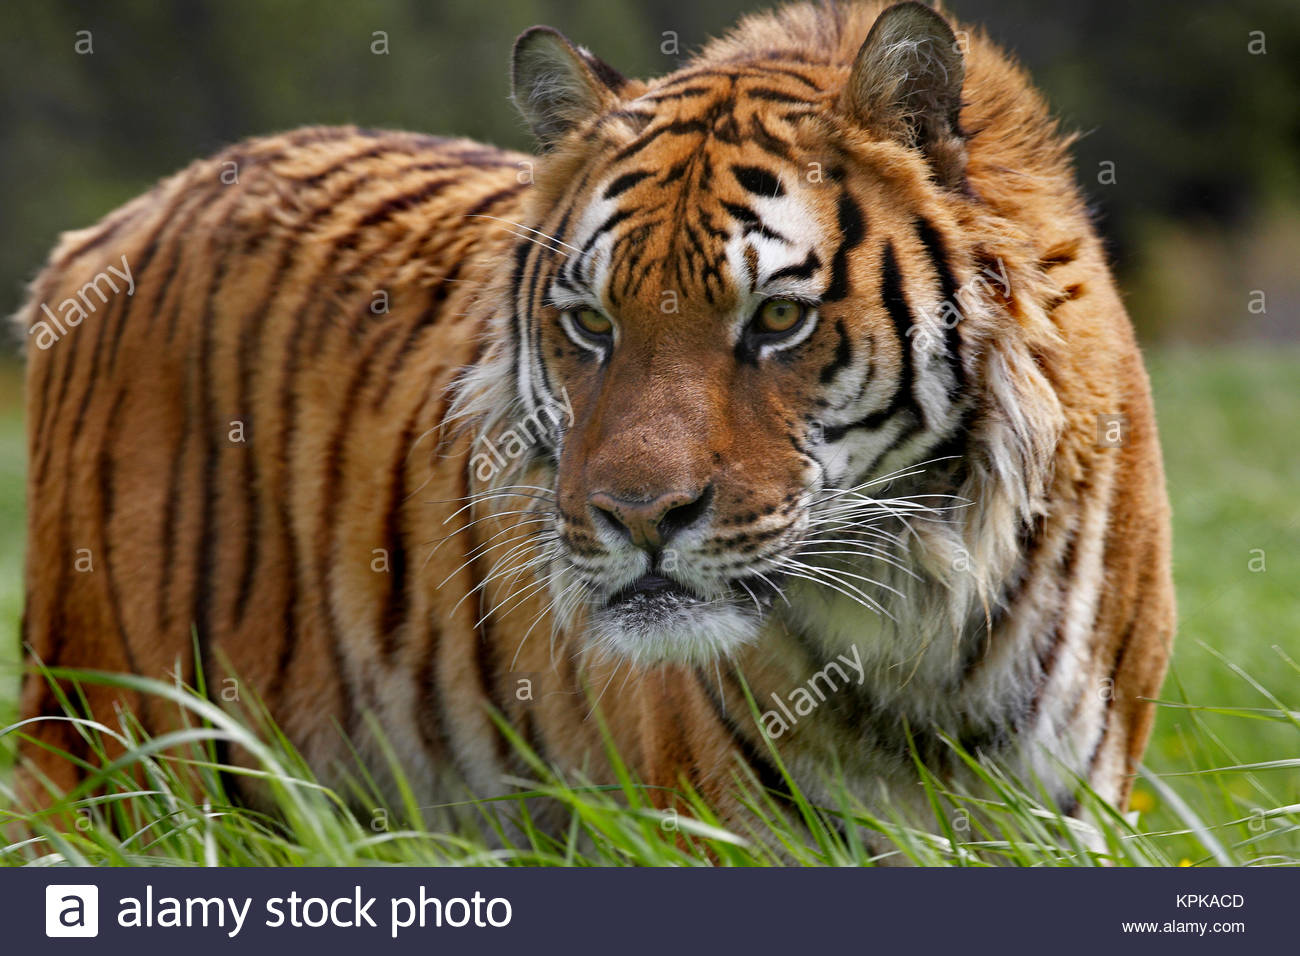 Tigre siberiano (Panthera tigris altaica). En cautiverio, Montana, EE.UU. Foto de stock